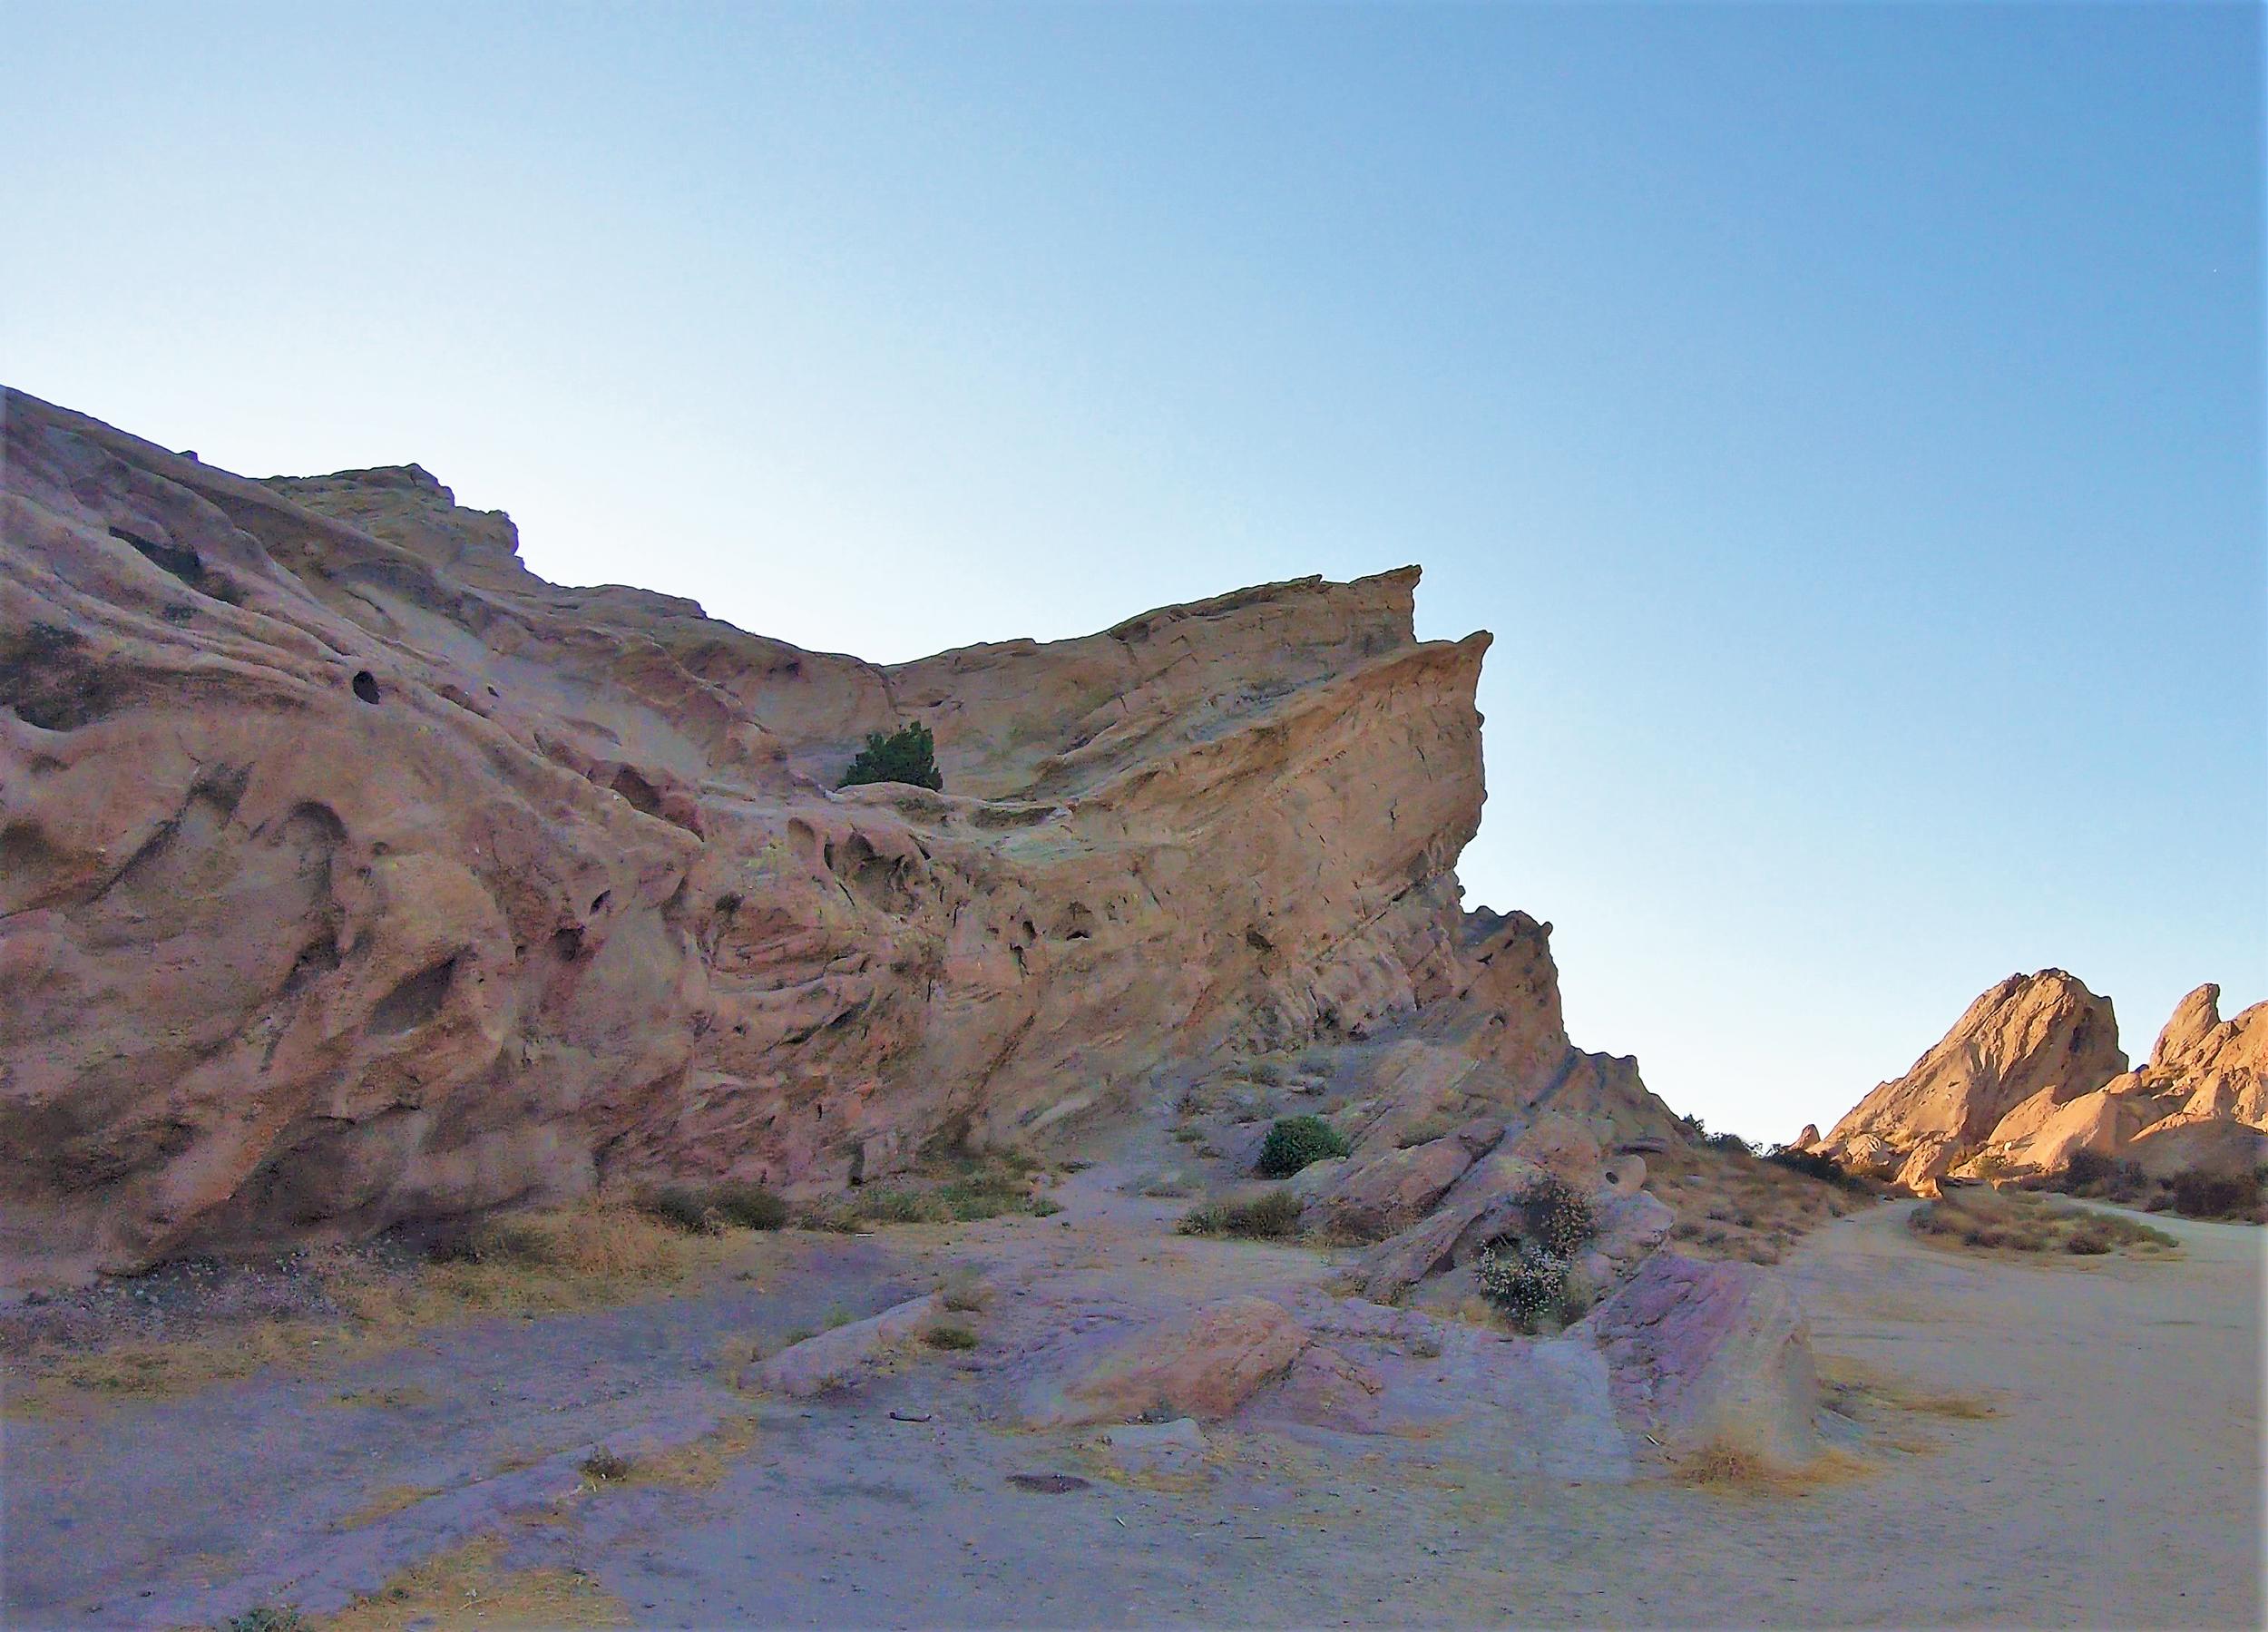 Vasquez Rocks in Los Angeles County